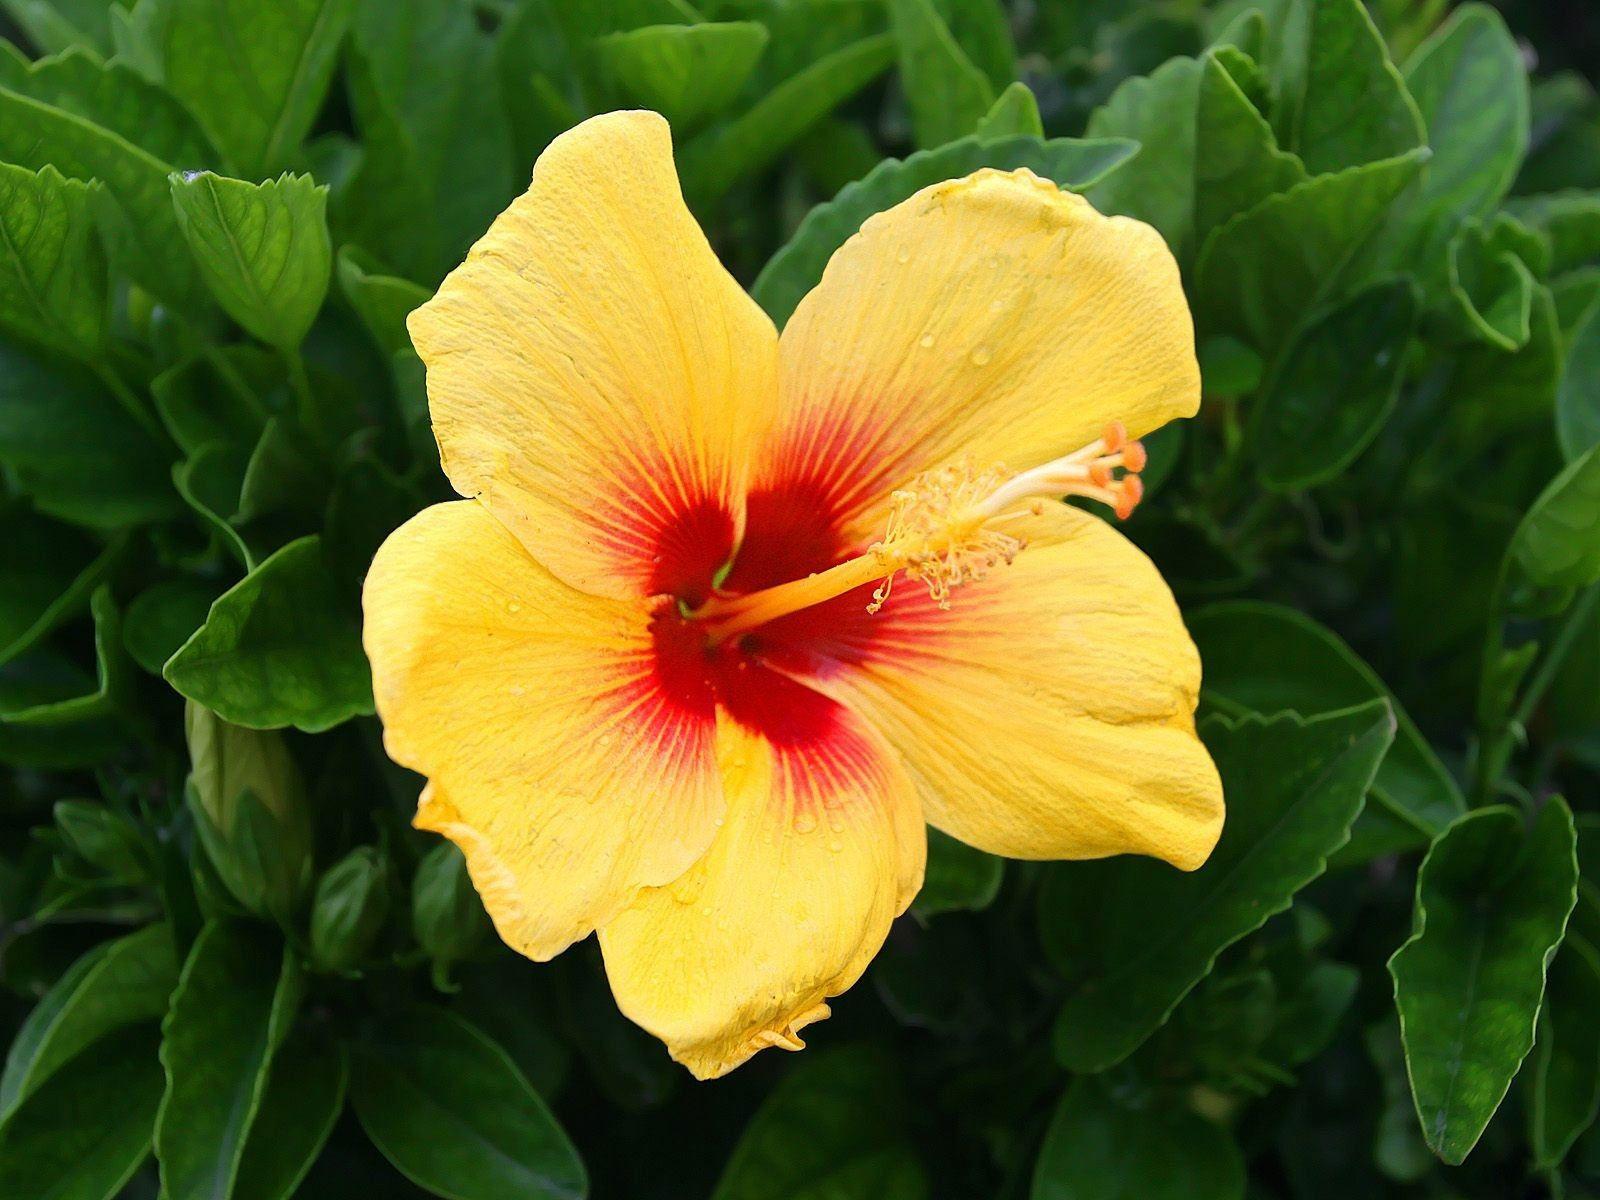 Flor Amarela Aberta 023244a6be620a701a19914a38be6e25 Yellow Hibiscus Jpg 1600 1200 Yellow Hibiscus Hibiscus Plant Plants